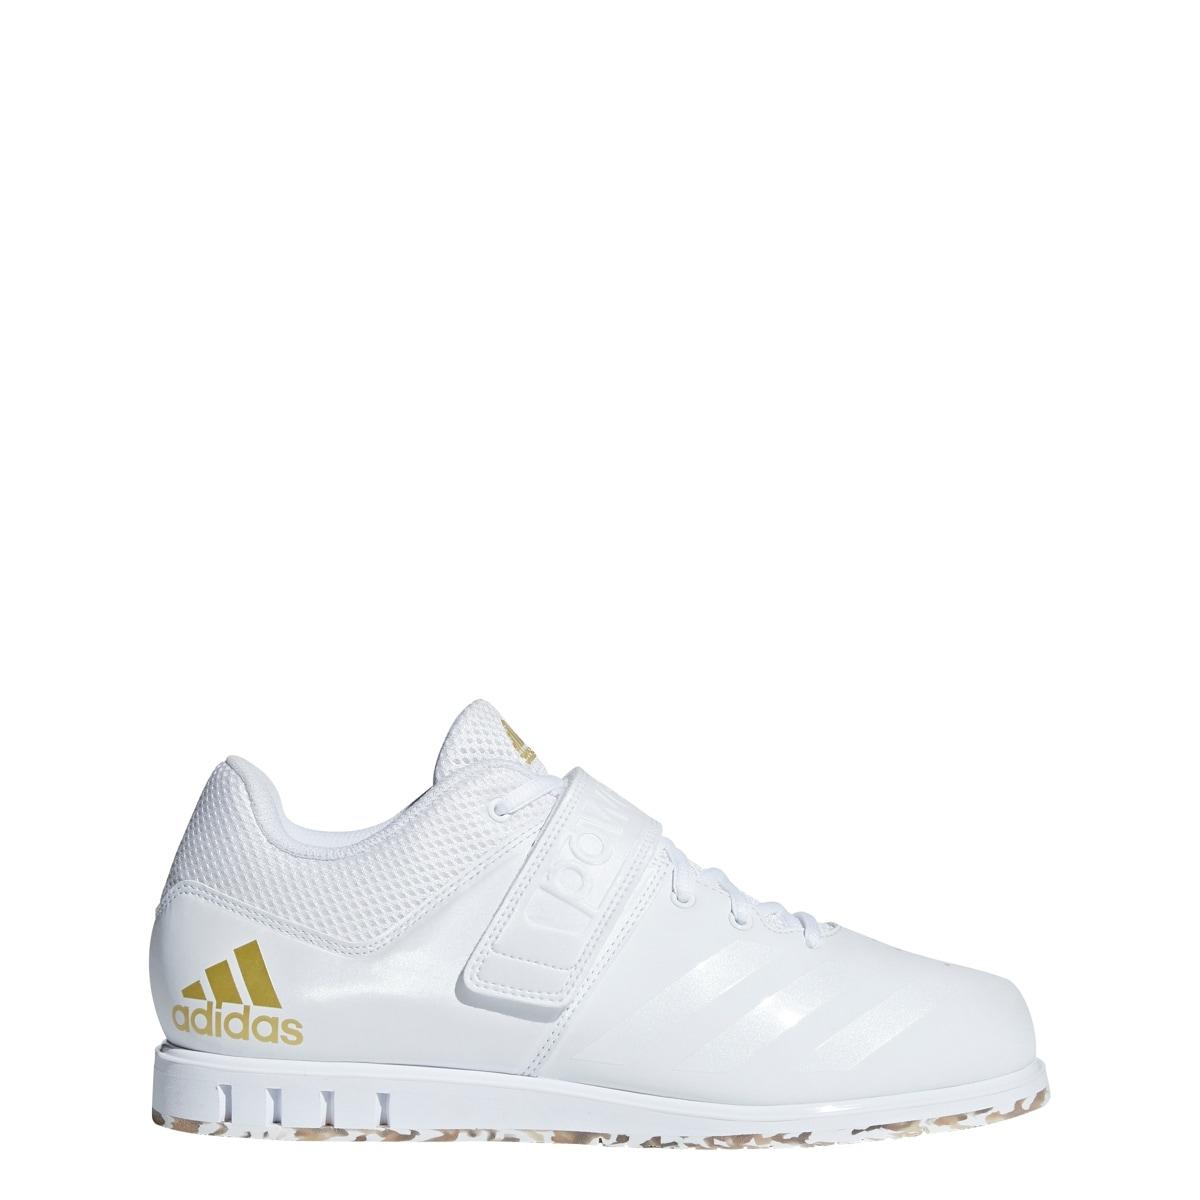 ce6cdb3bb6d44 Shop Size 8 Adidas Clothing   Shoes